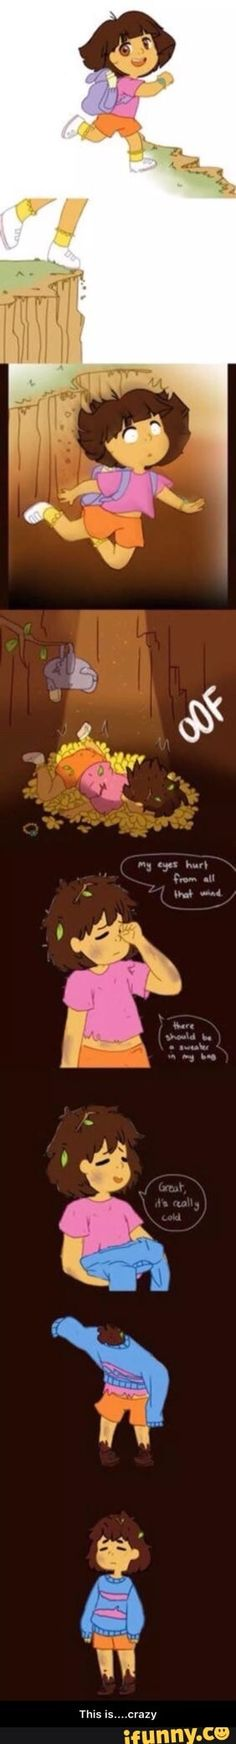 Well that explains why Frisk looks Dora. Frisk IS Dora! Undertale Memes, Undertale Cute, Undertale Fanart, Undertale Comic, Frisk, 4 Panel Life, Mini Comic, Underswap, Totoro